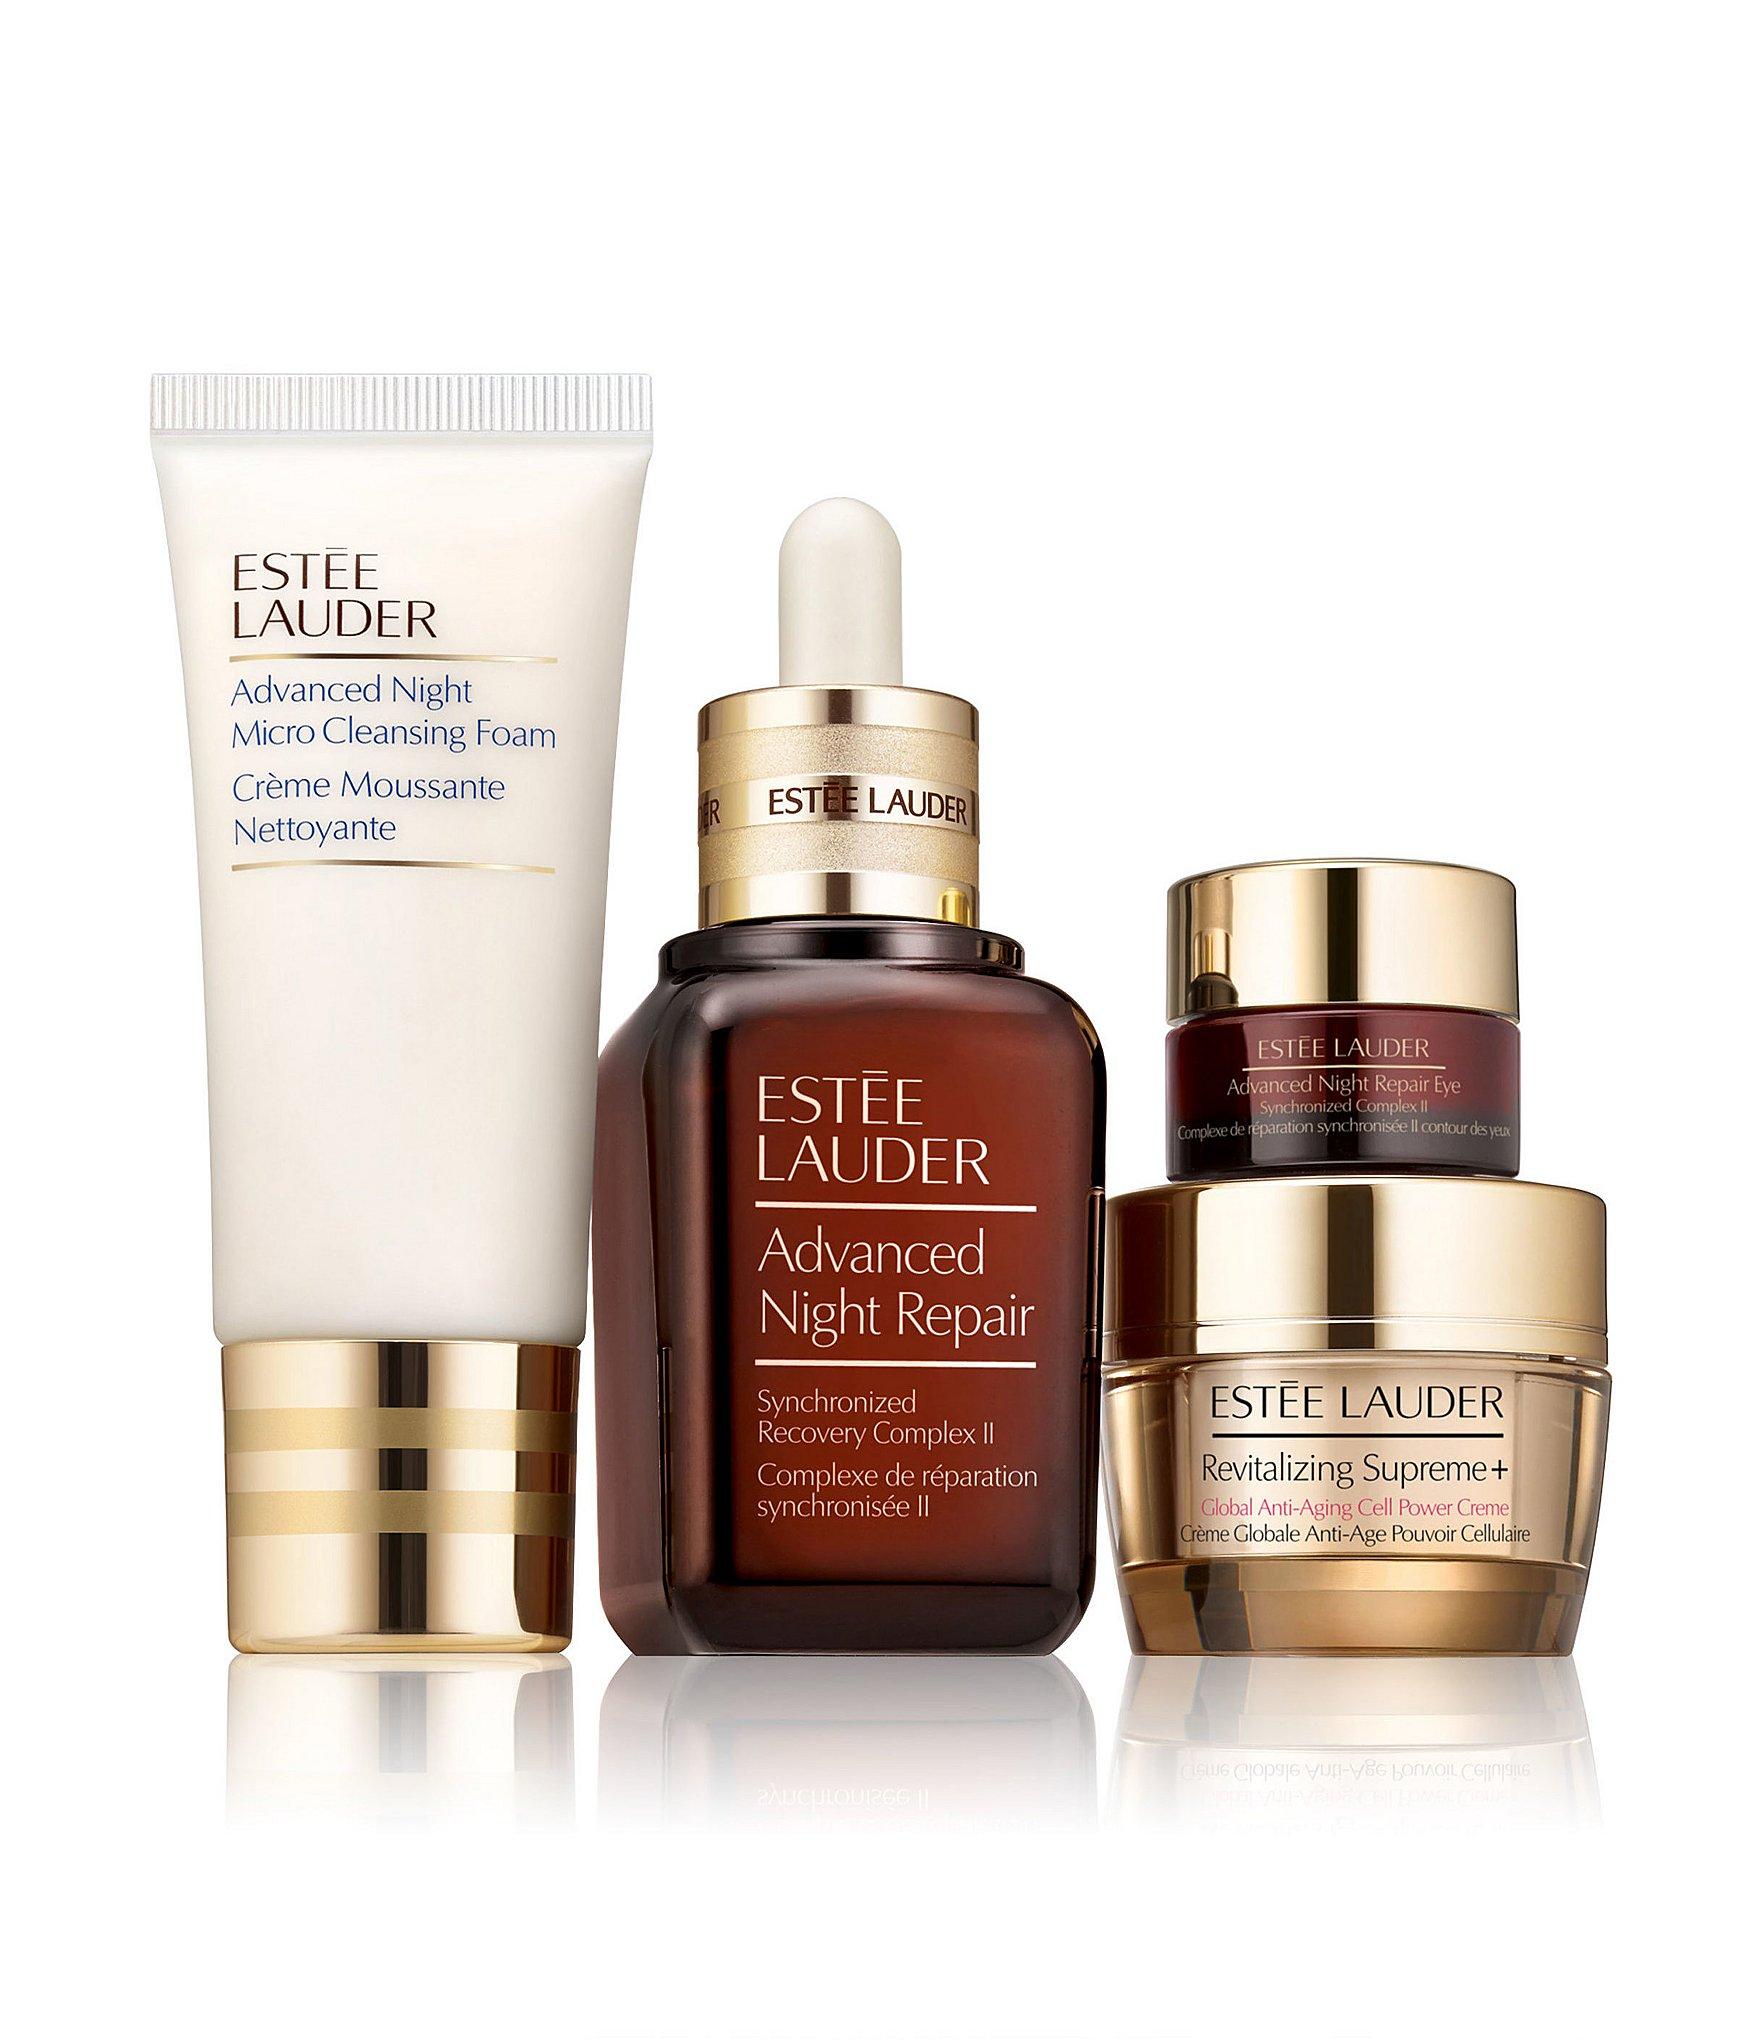 Estee Lauder Makeup Gift Set